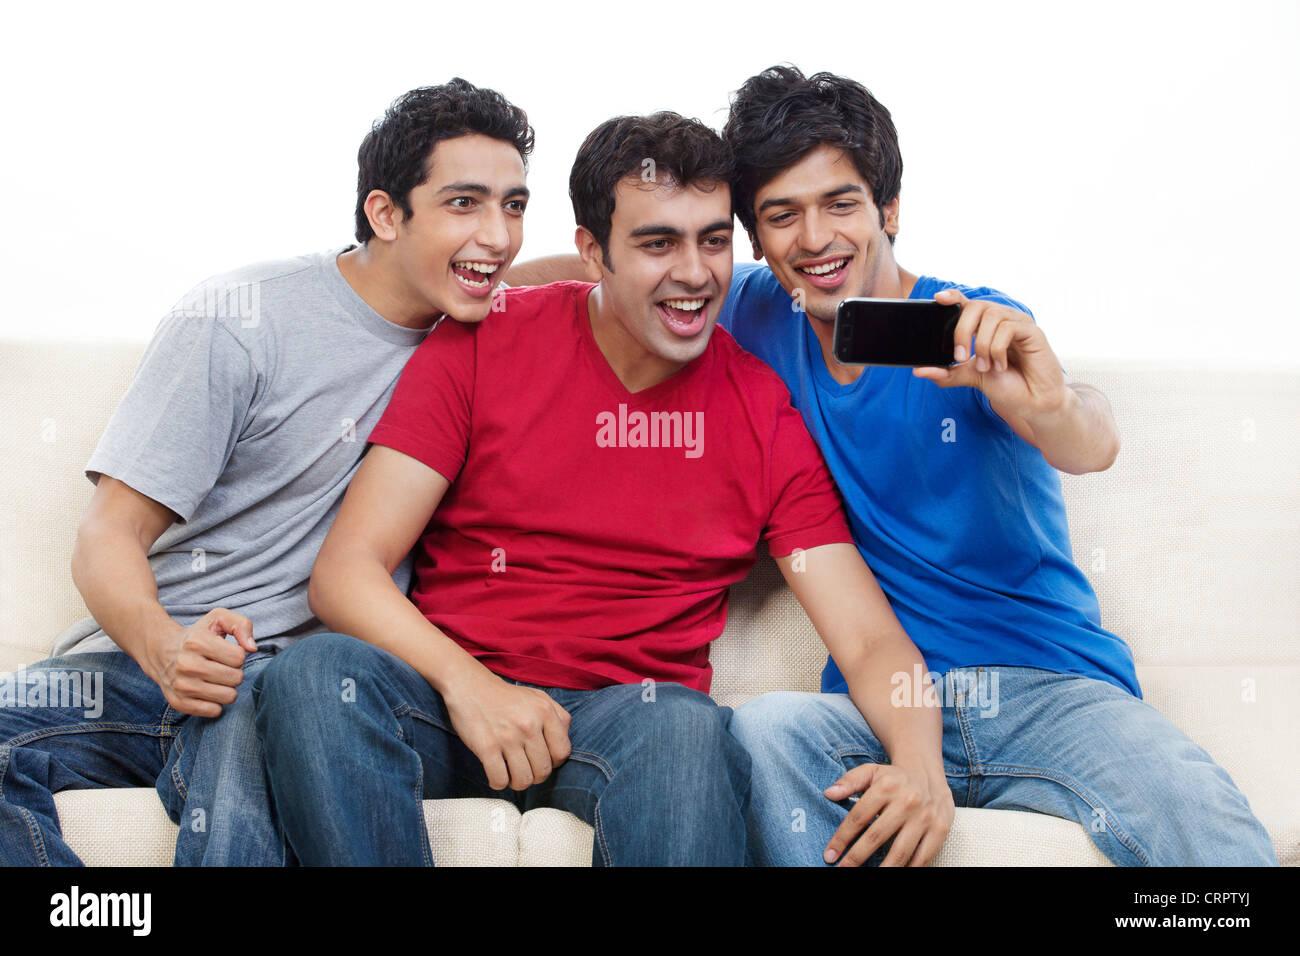 Three friends talking self portrait photograph - Stock Image